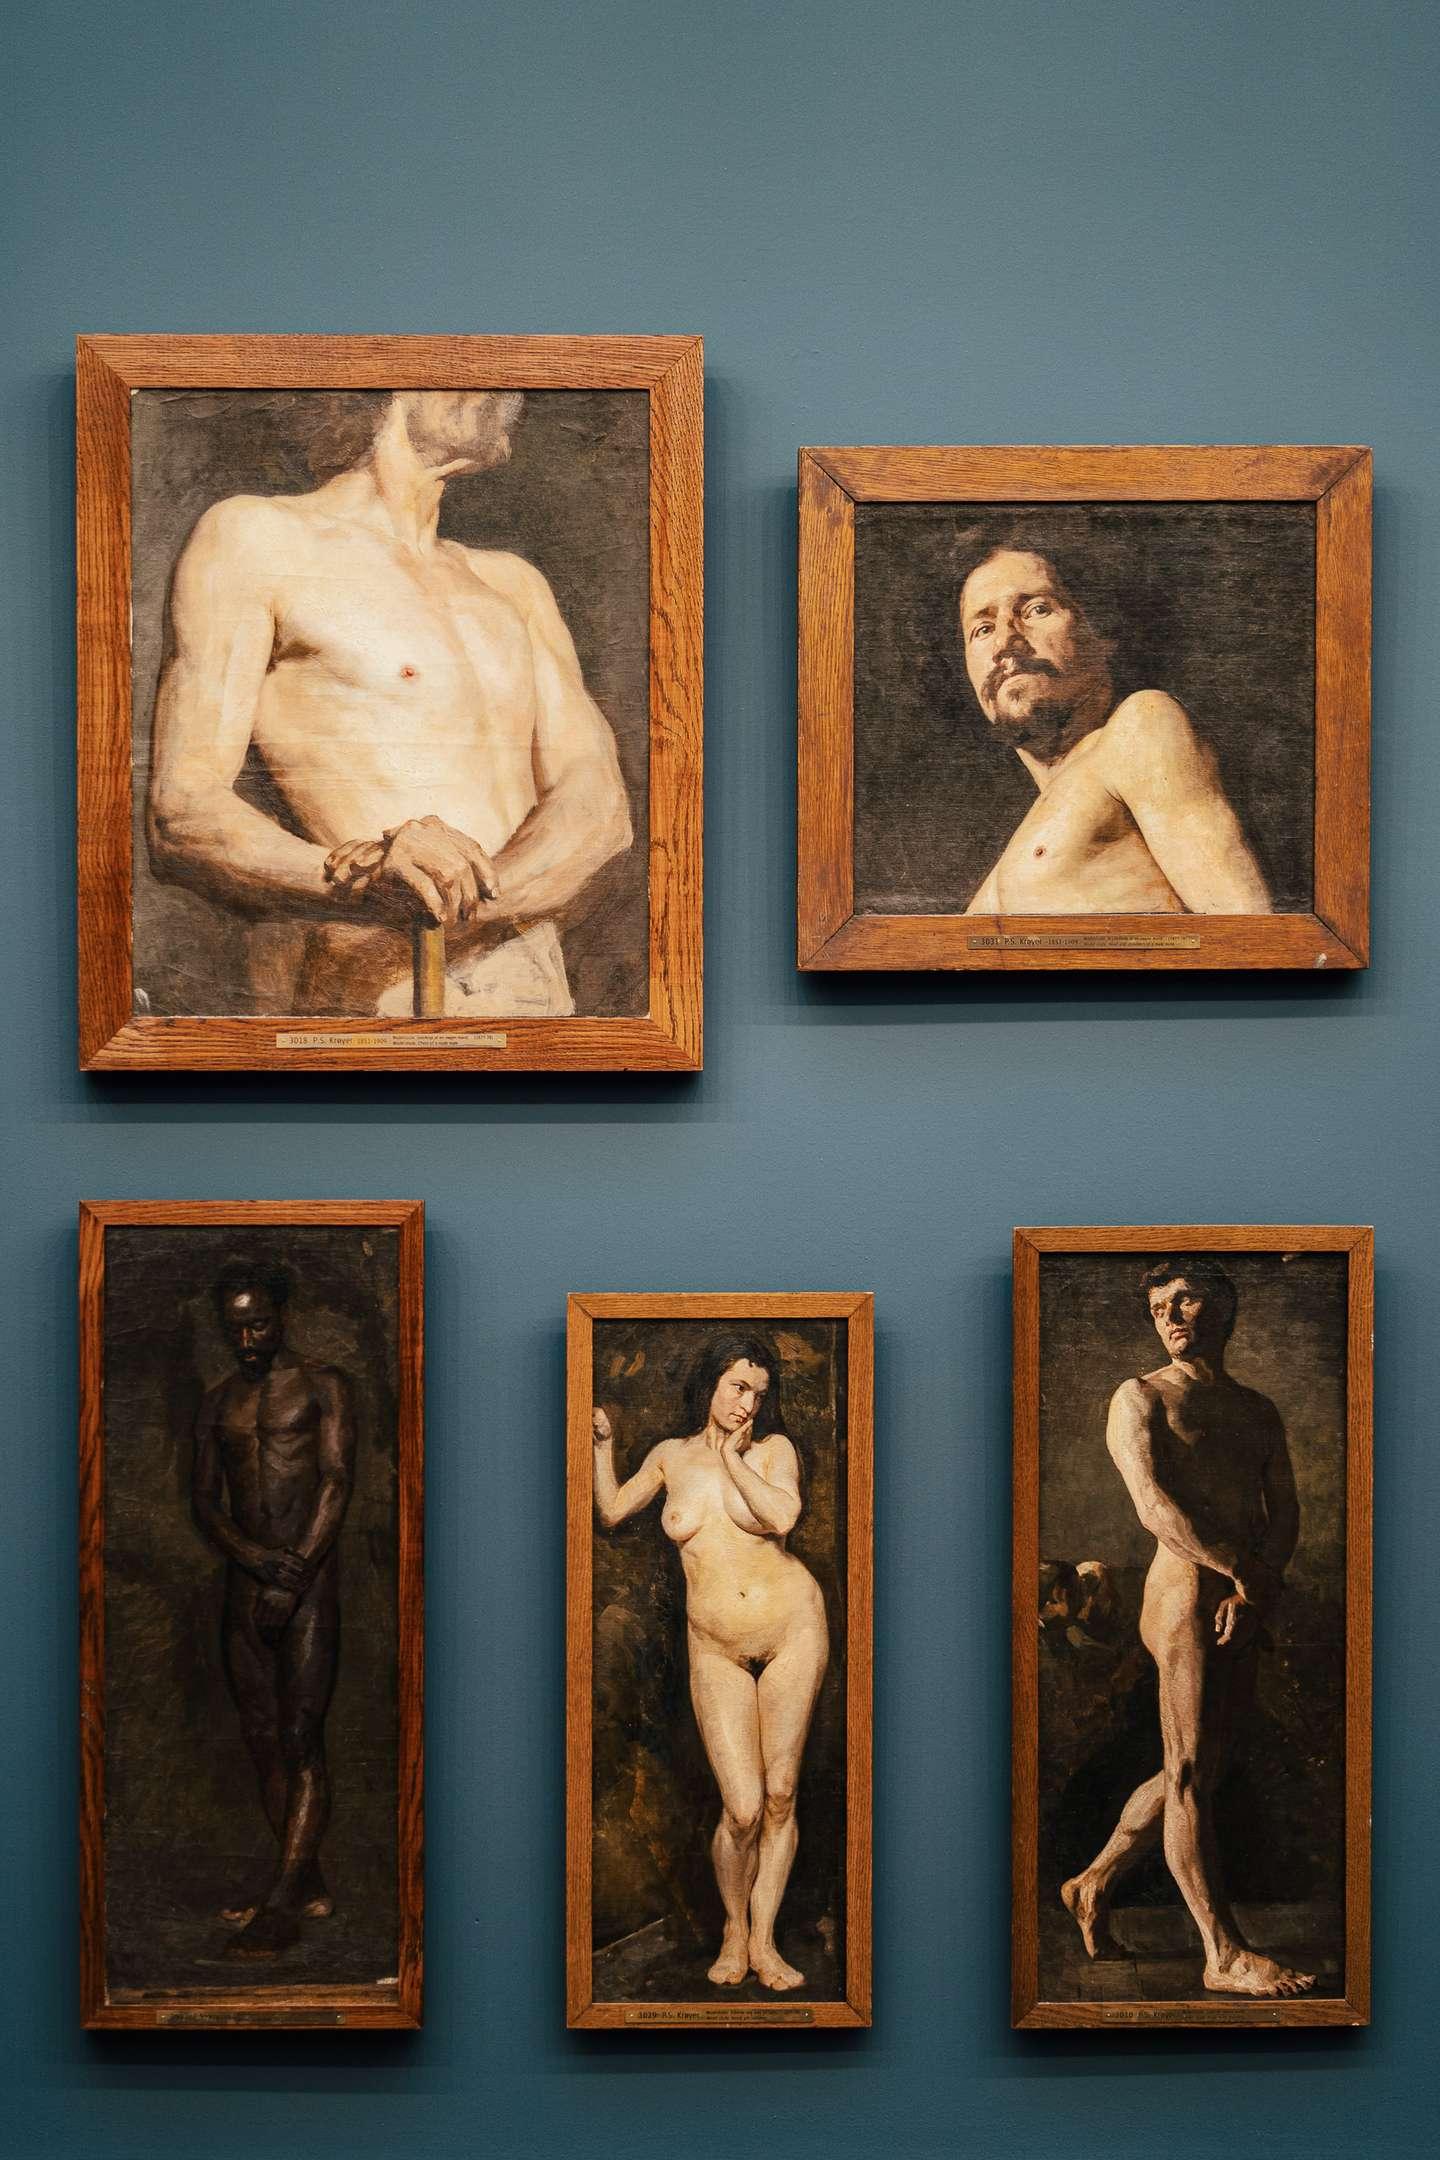 Pieces of art at the Hirschsprung Collection